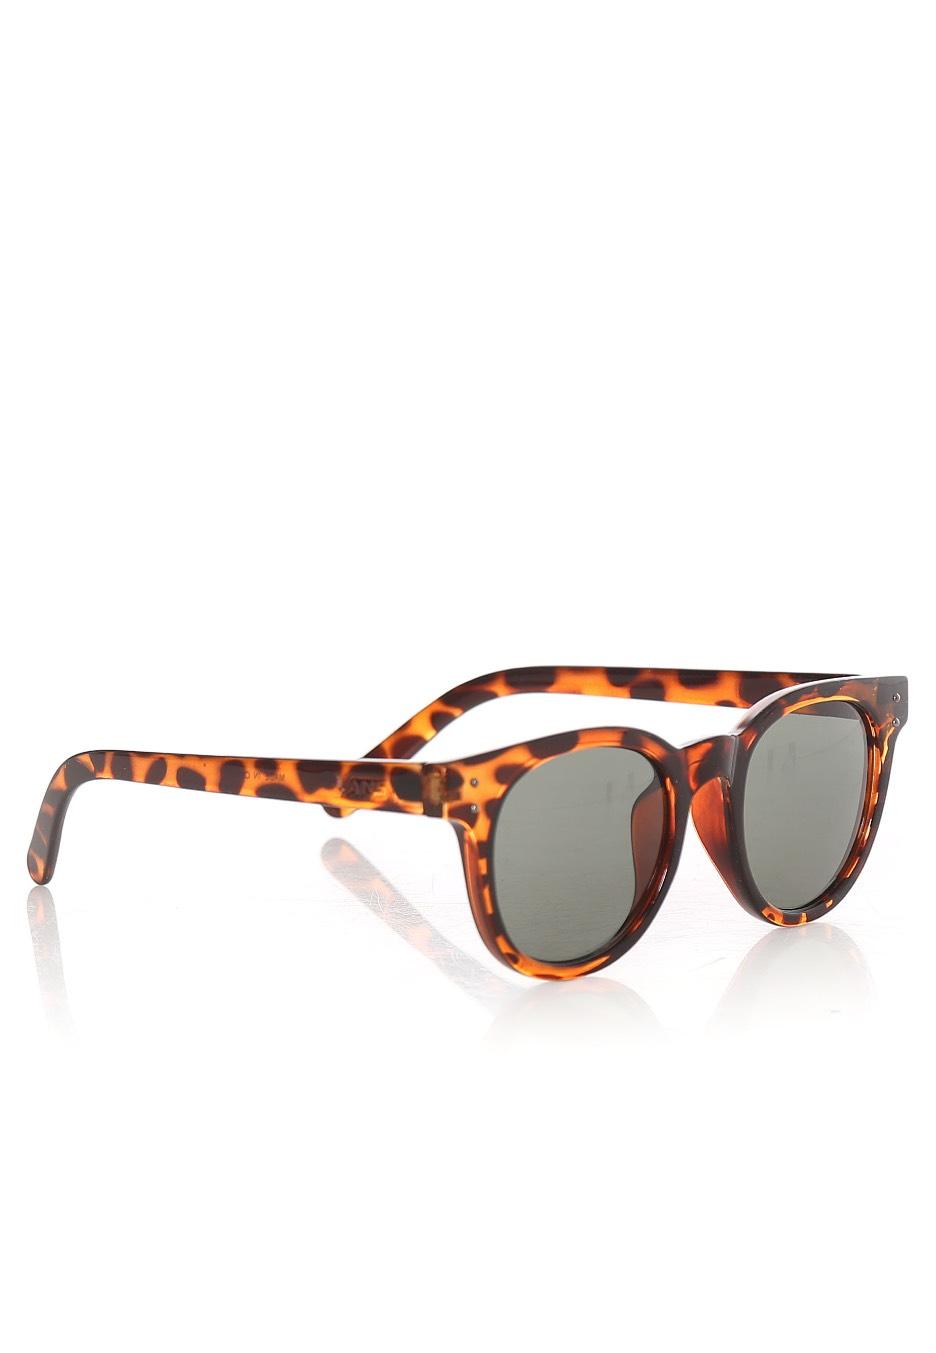 8df43f4edd Vans - Welborn Shades Translucent Honeytortoise/Green - Sunglasses -  Impericon.com UK